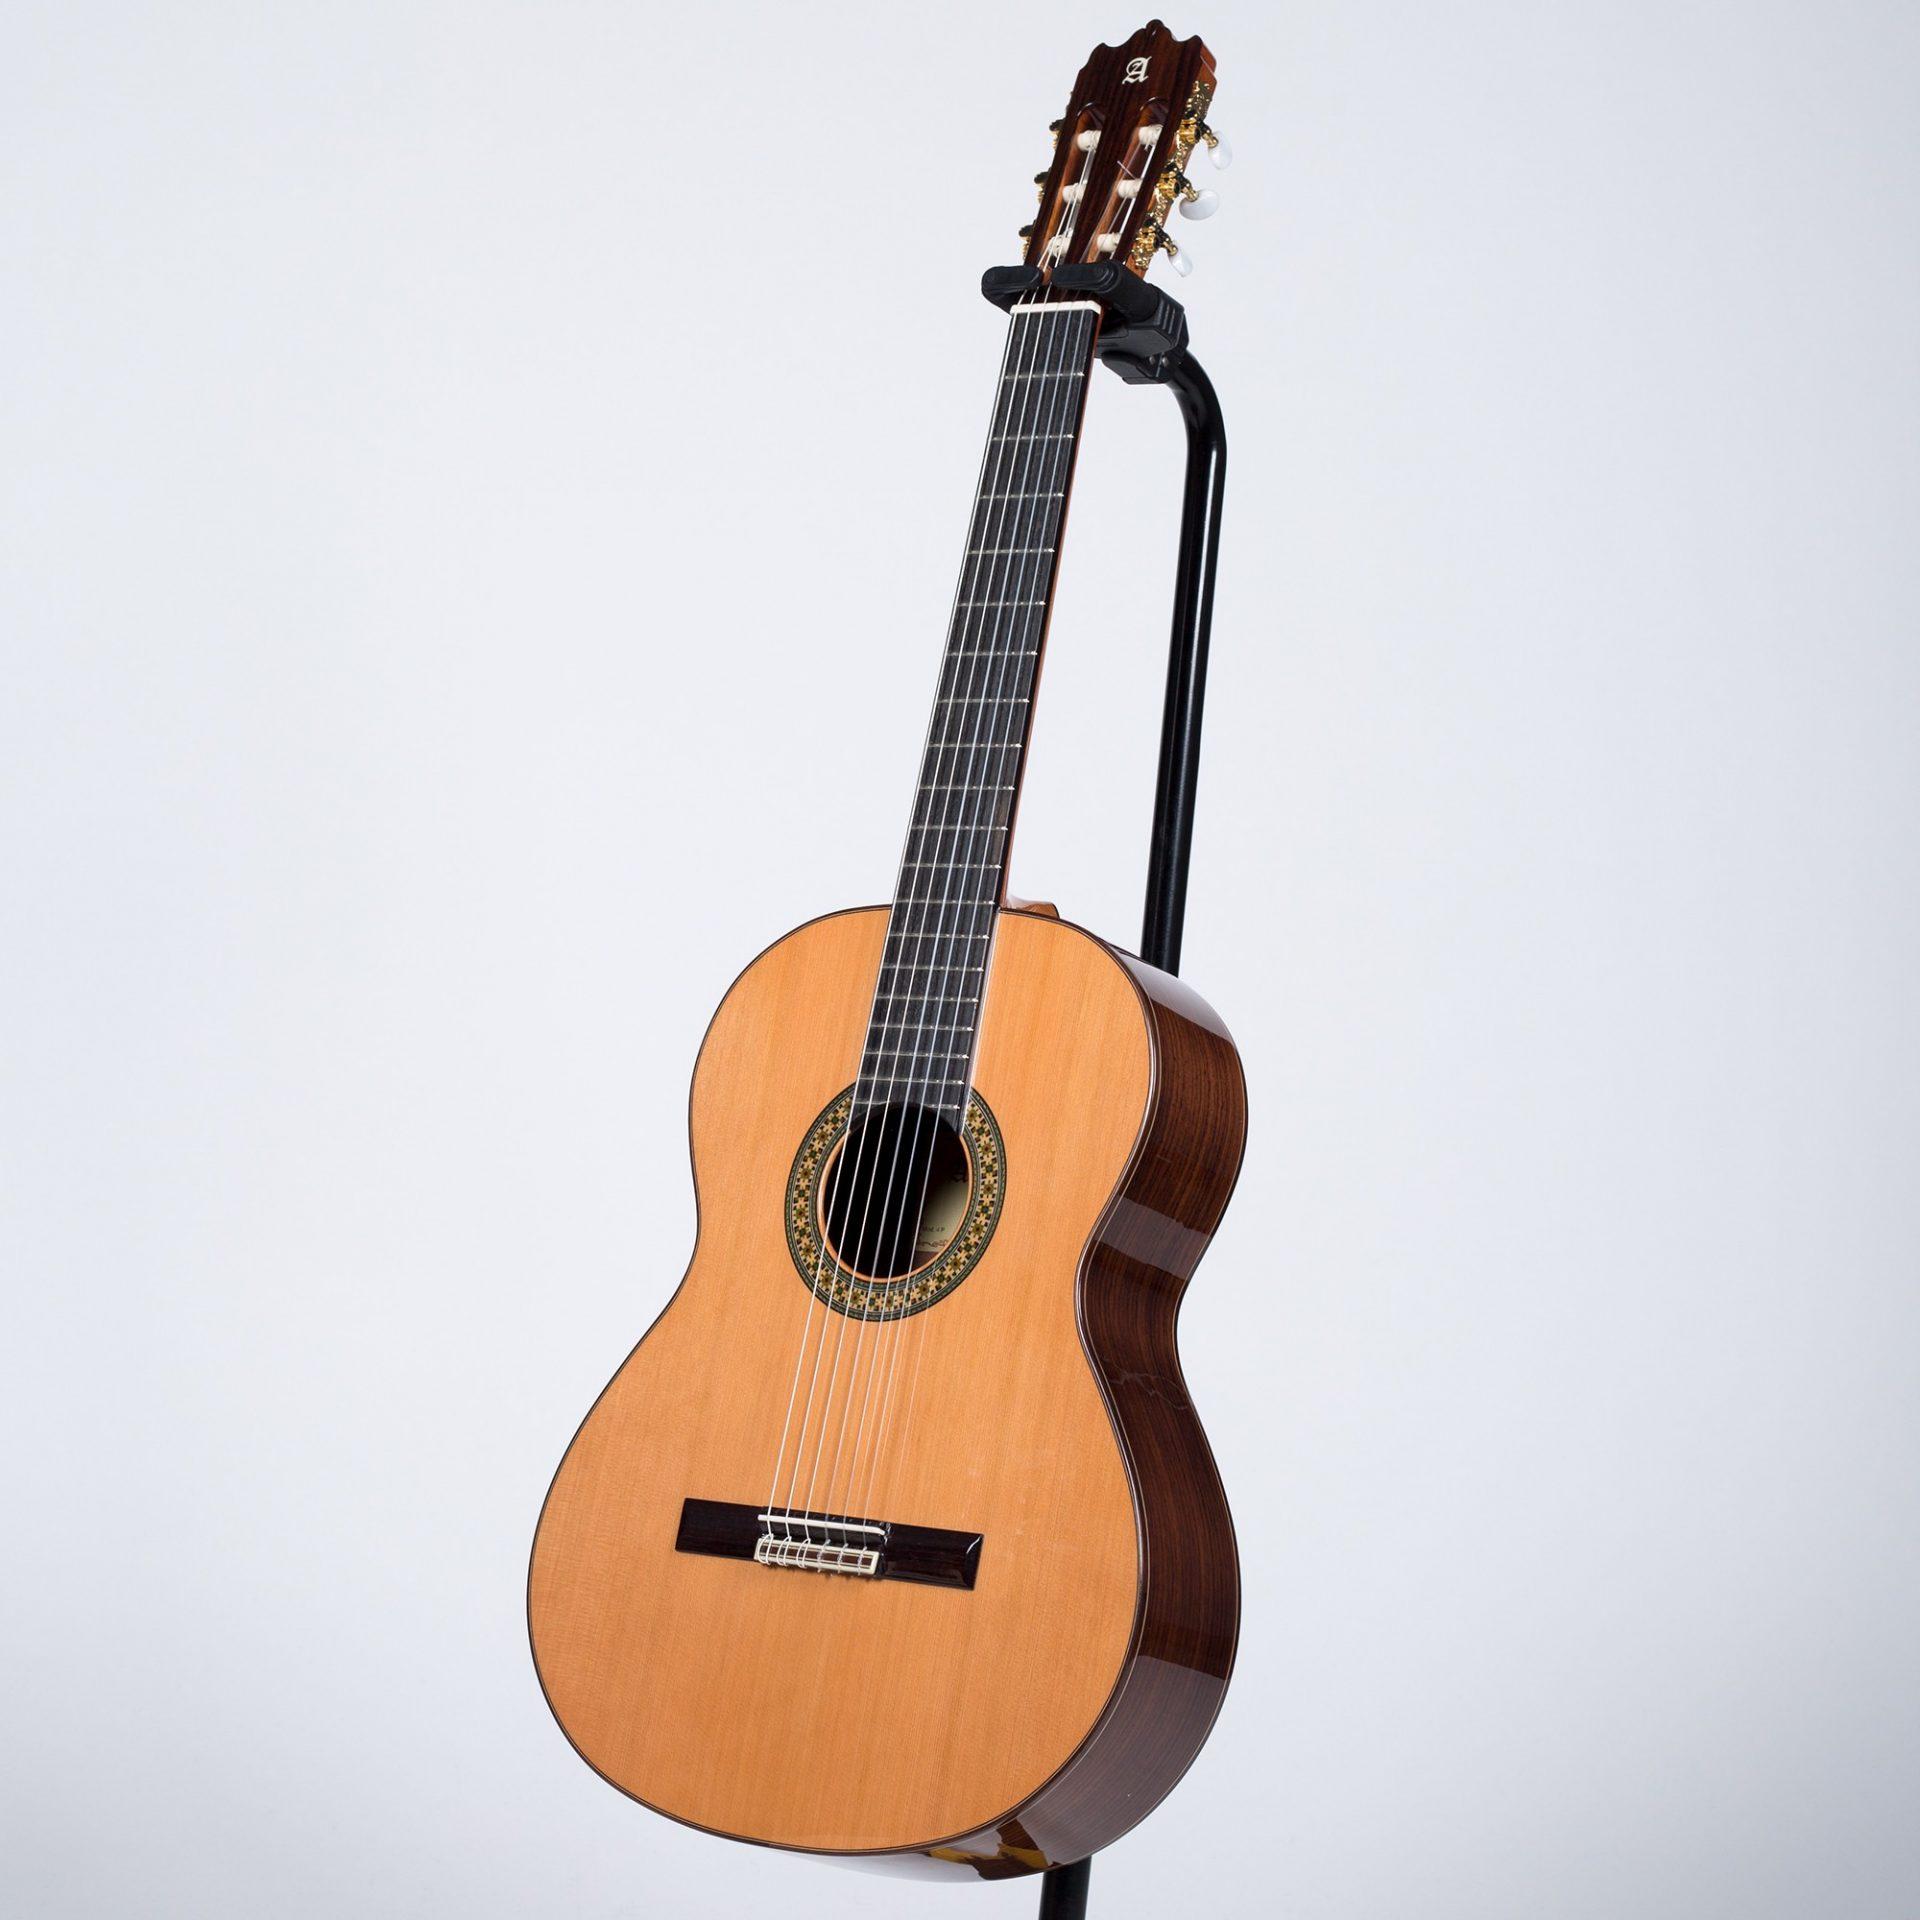 گیتار الحمرا